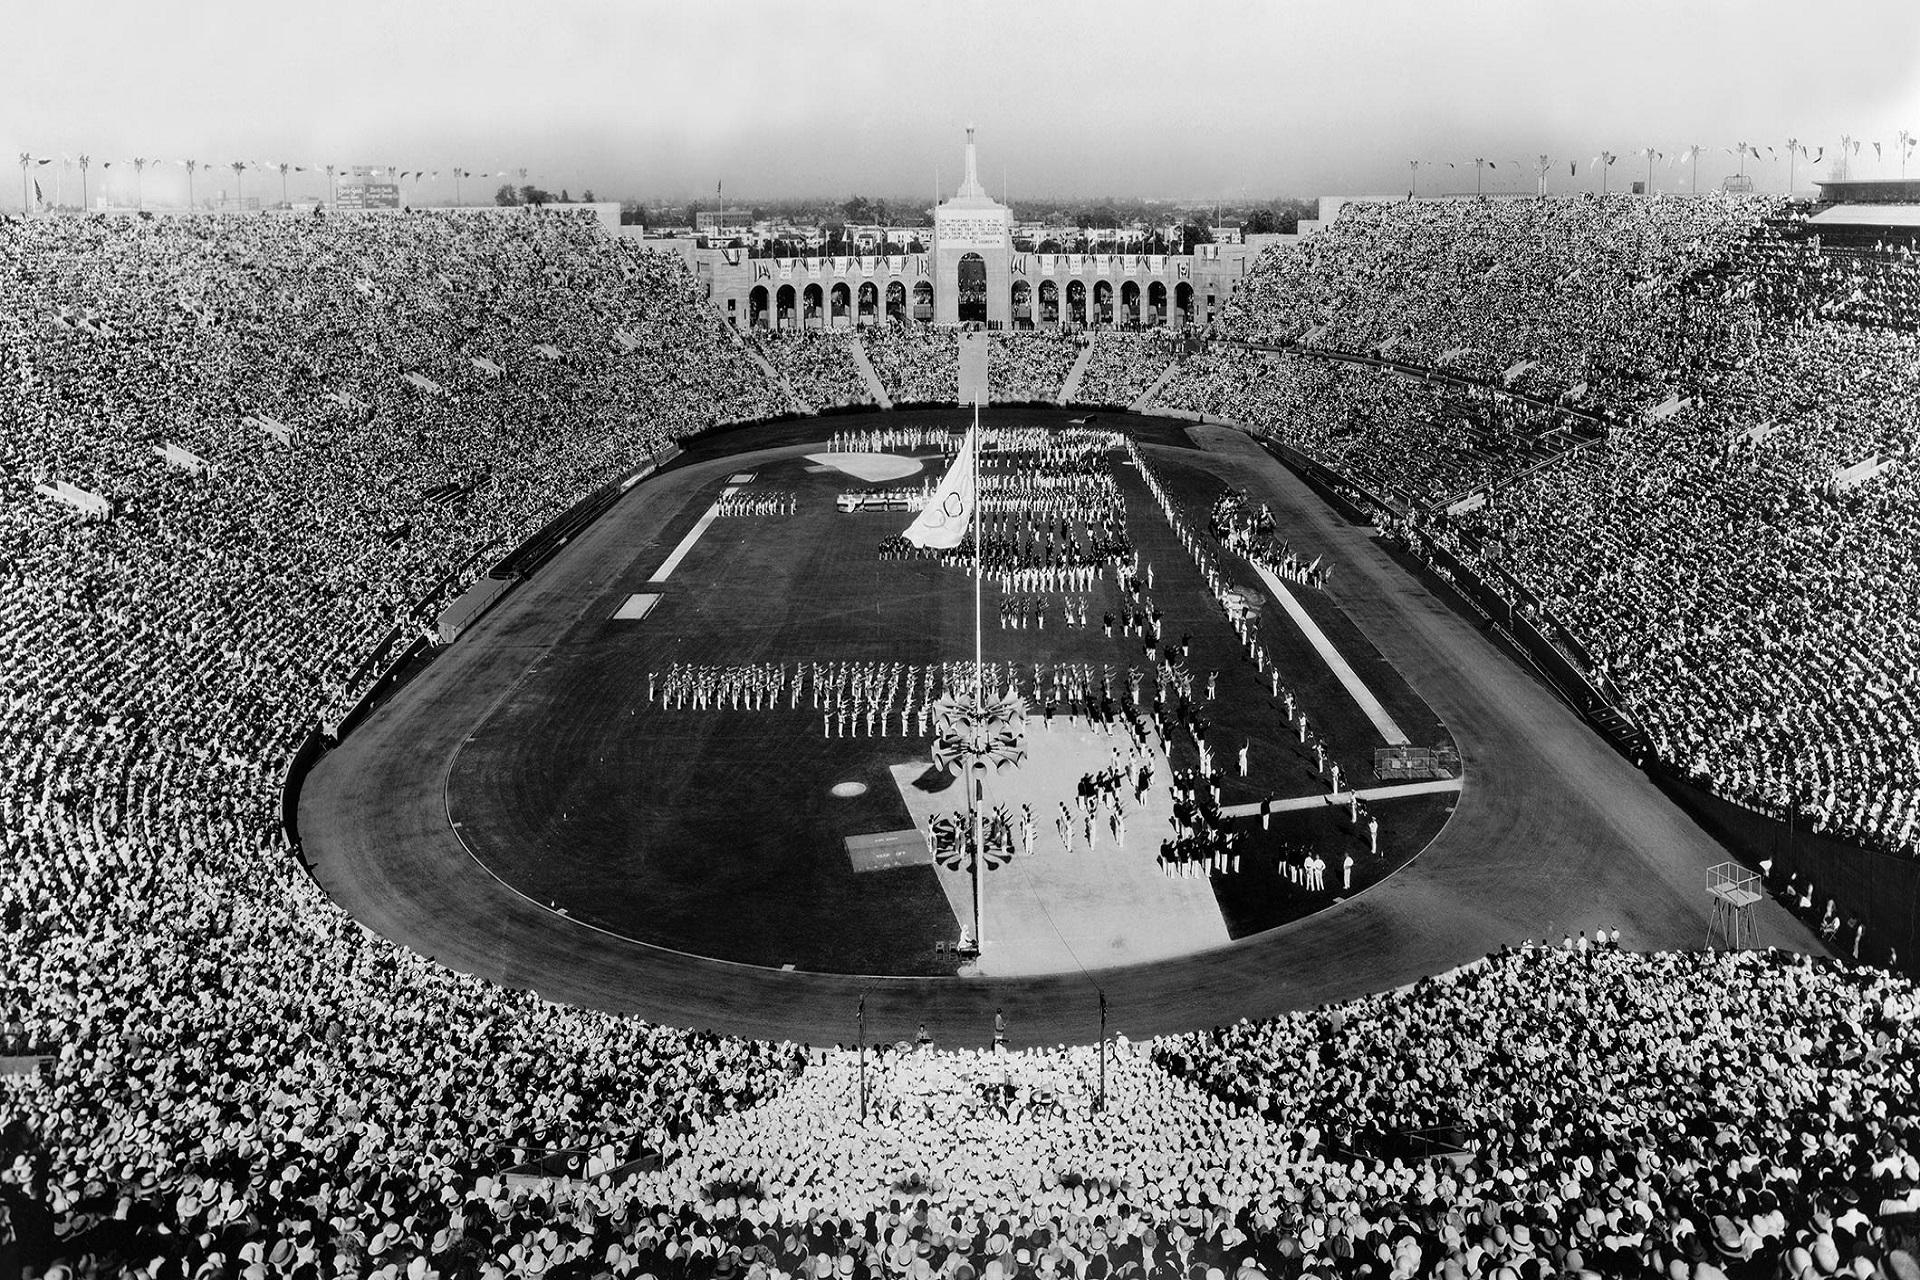 Cerimónia de Abertura dos Jogos Olímpicos de Los Angeles 1932.